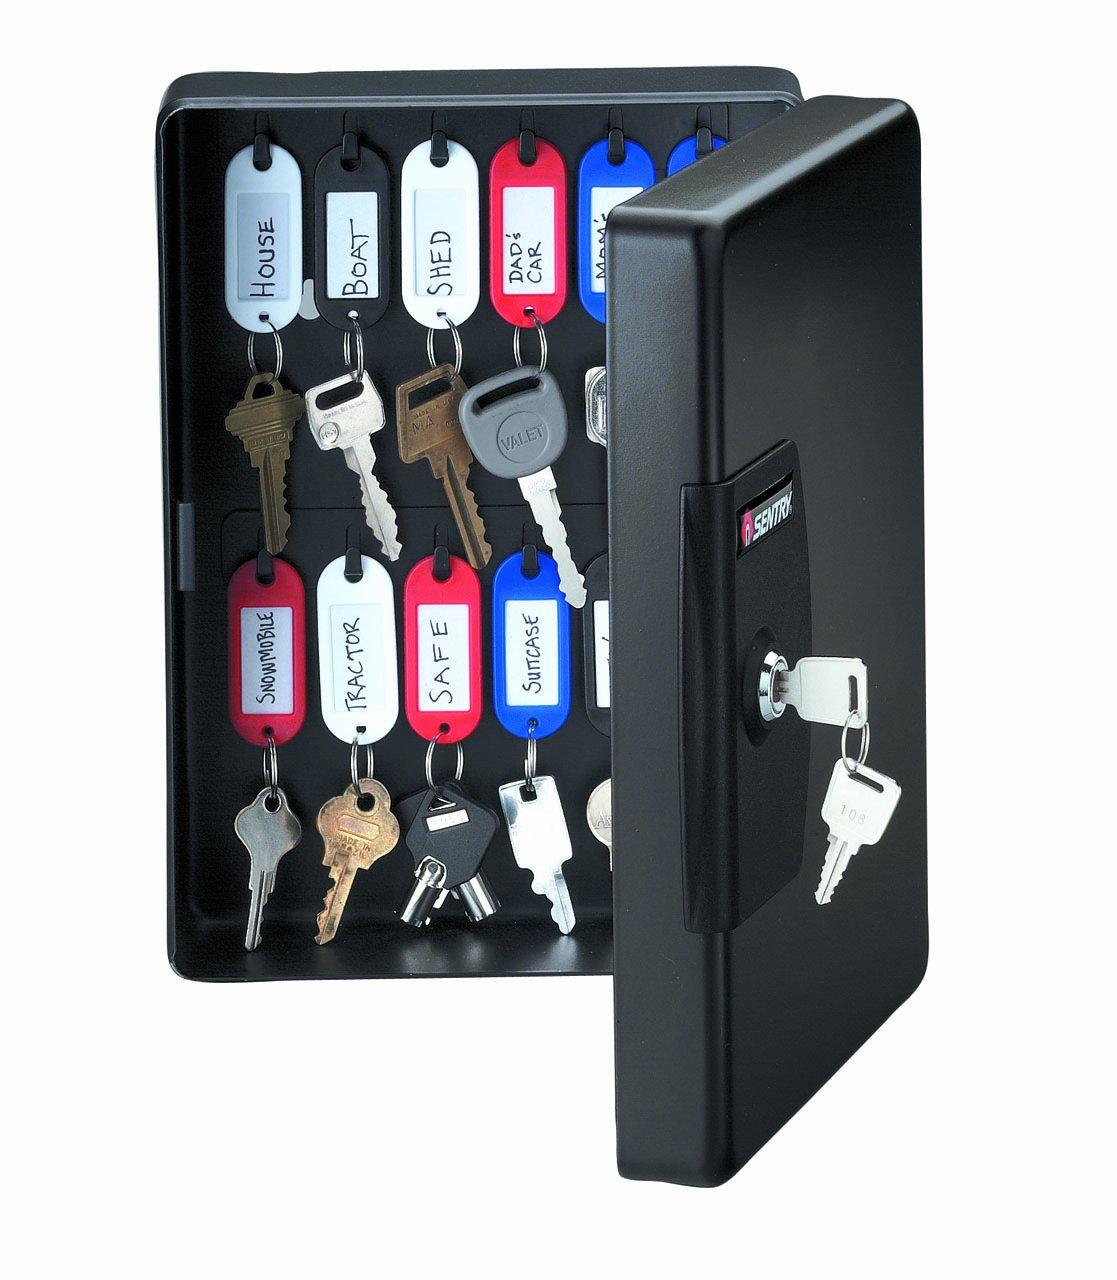 SentrySafe Key Box Small Key Lock Box 0.06 Cubic Feet KB-25 - Key Cabinets - Amazon.com  sc 1 st  Amazon.com & SentrySafe Key Box Small Key Lock Box 0.06 Cubic Feet KB-25 - Key ...